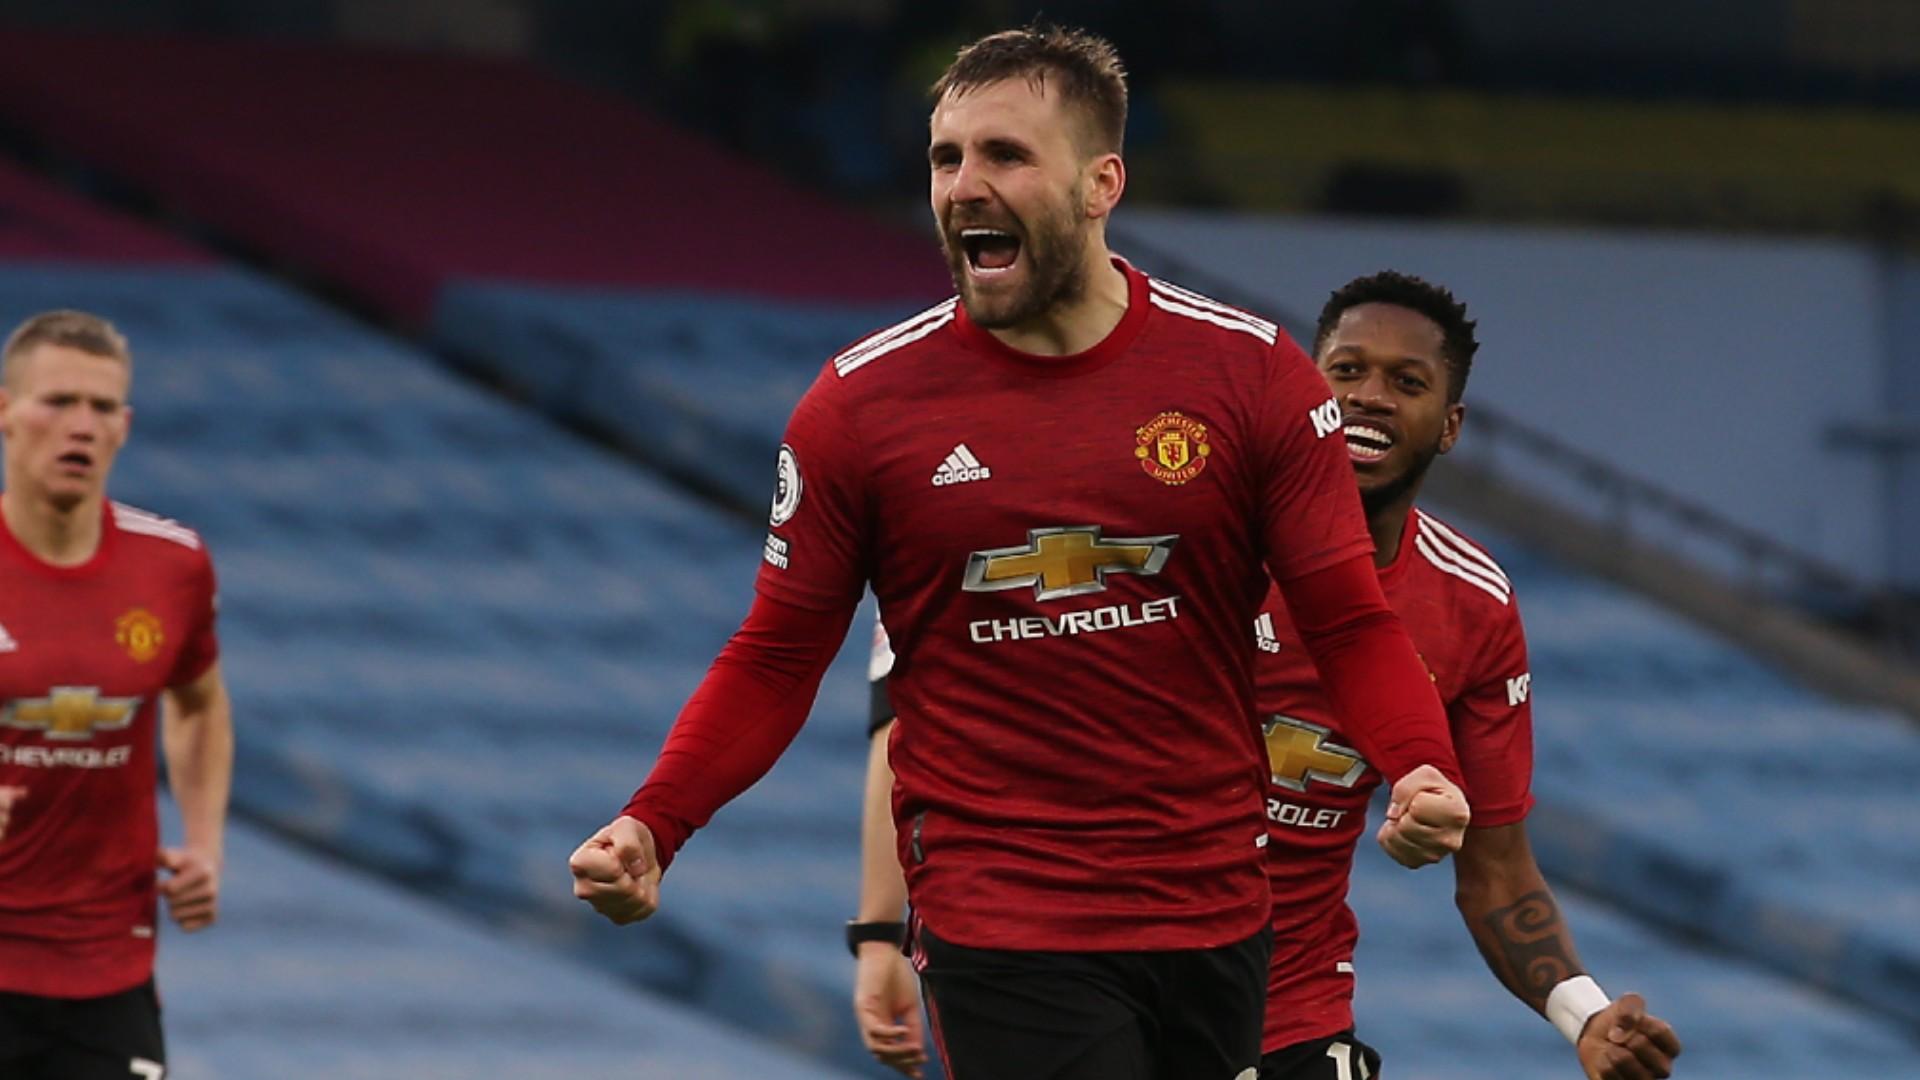 Man Utd boss Solskjaer hails 'absolutely incredible' Shaw, offers Rashford injury update after derby delight